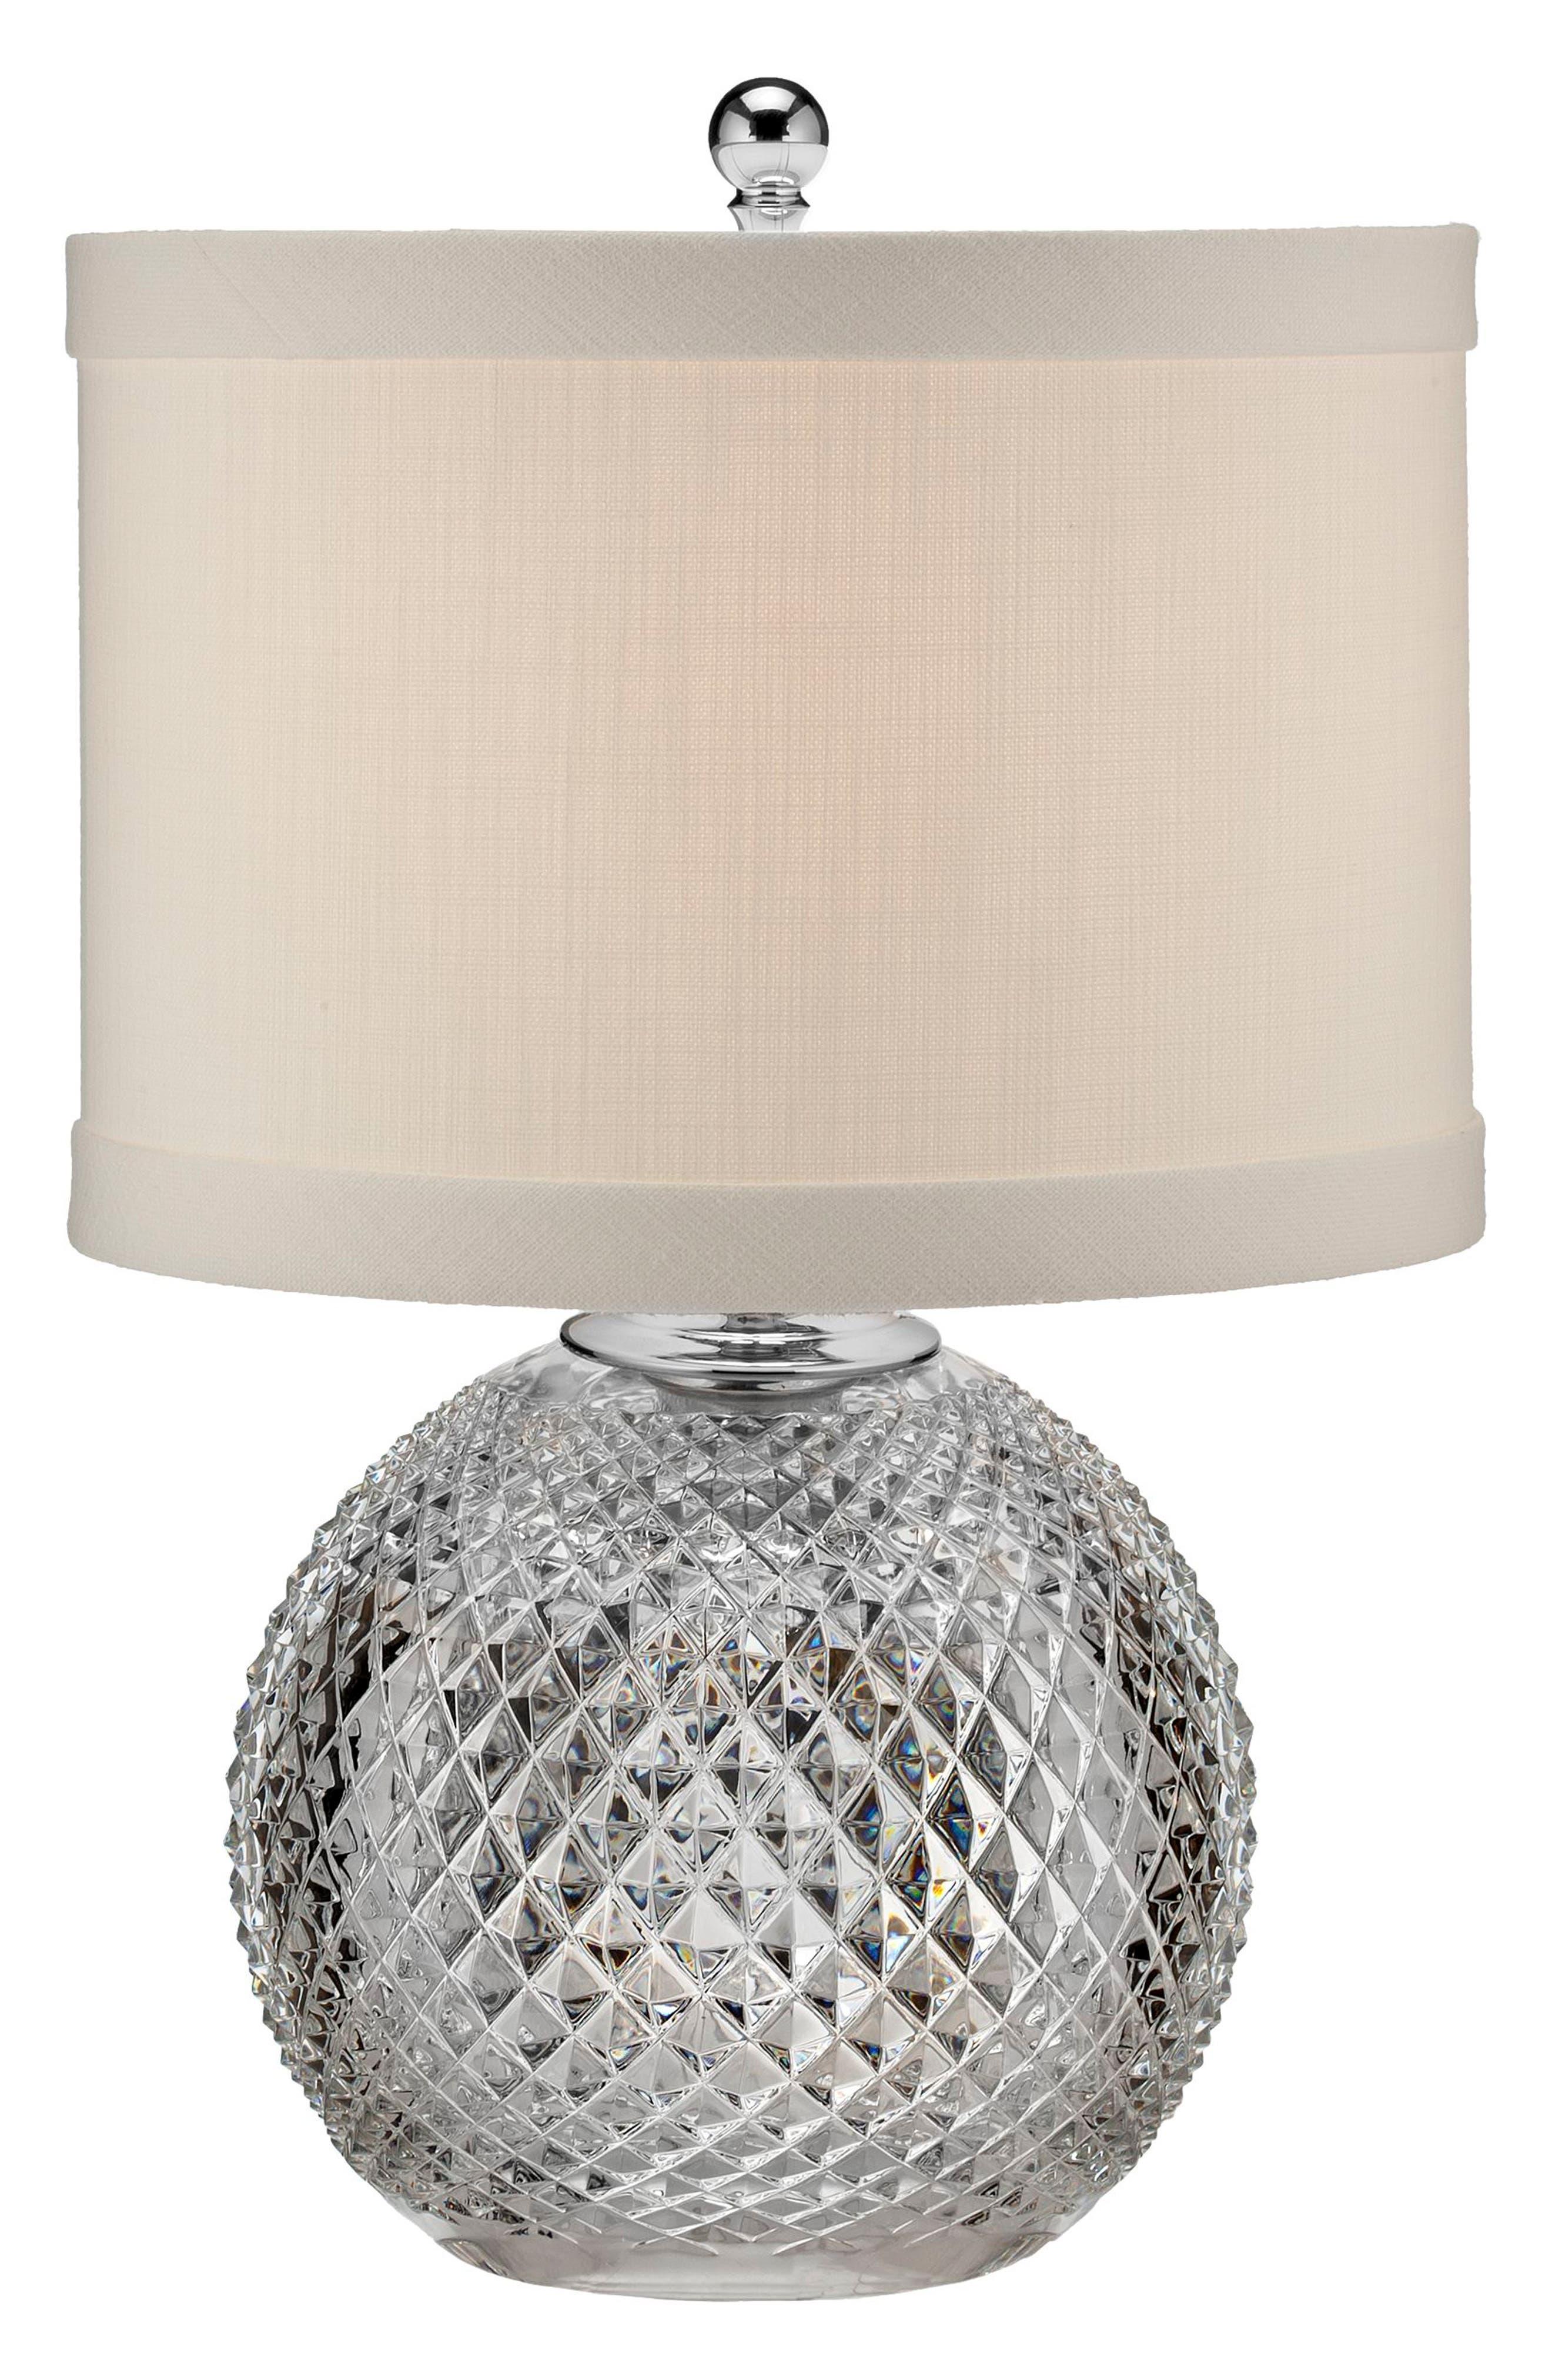 Main Image - Waterford Alana Crystal & Chrome Table Lamp